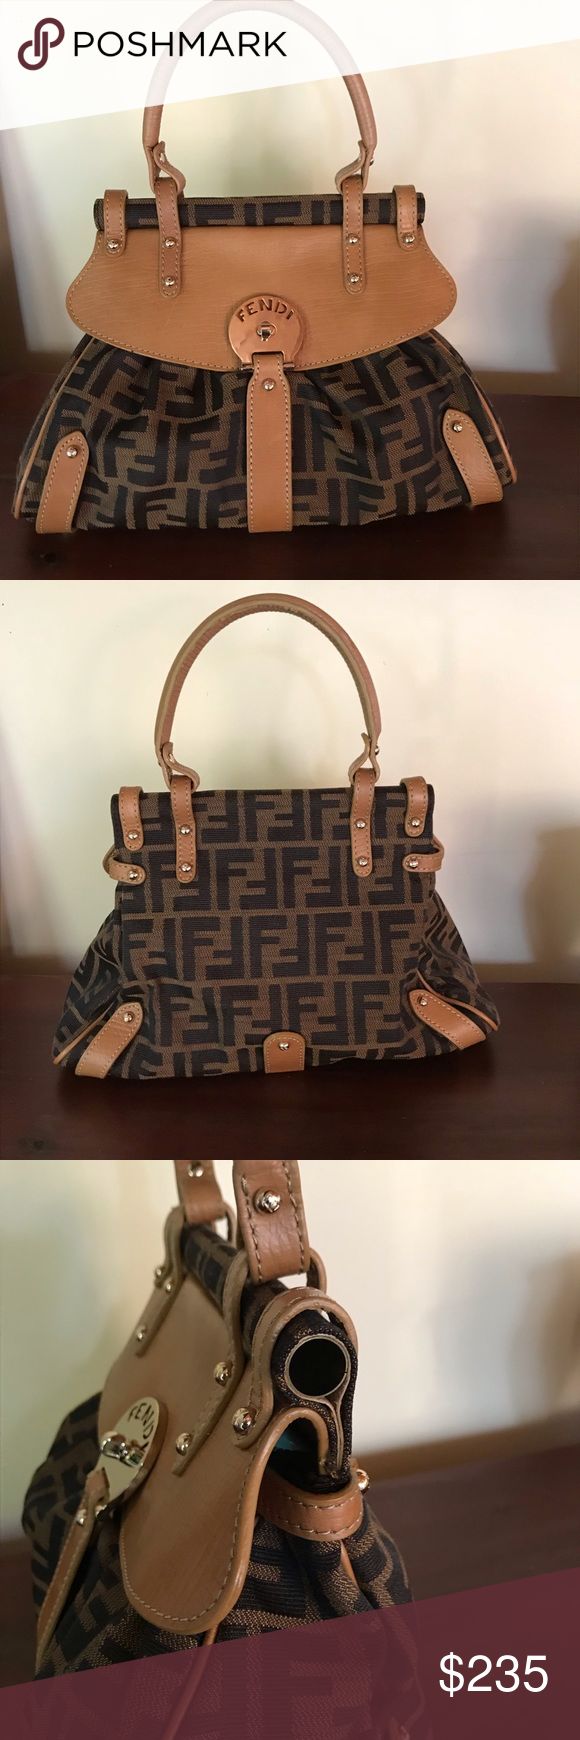 b0e4a41a110 FENDI Zucca Monogram Canvas Leather Purse Bag Fendi handbag. Brown leather  with logo canvas.